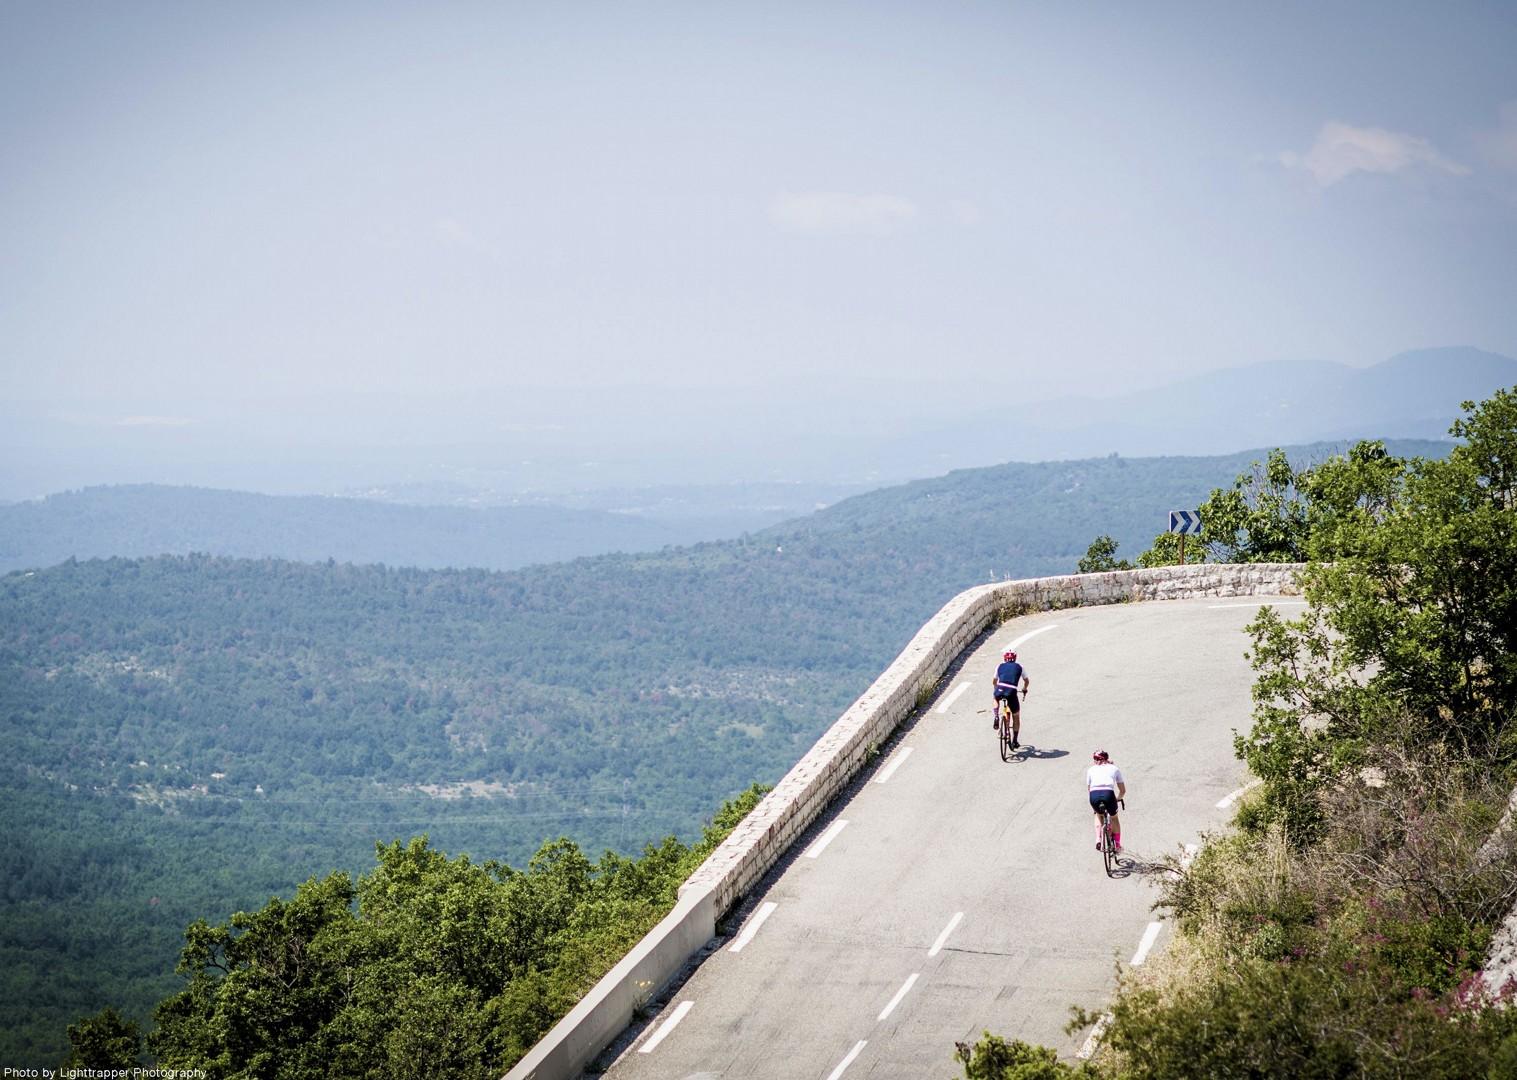 pro-cycling-col-de-la-madone-climb-cycling-road.jpg - NEW! France - Provence - Alpes Maritimes - Road Cycling